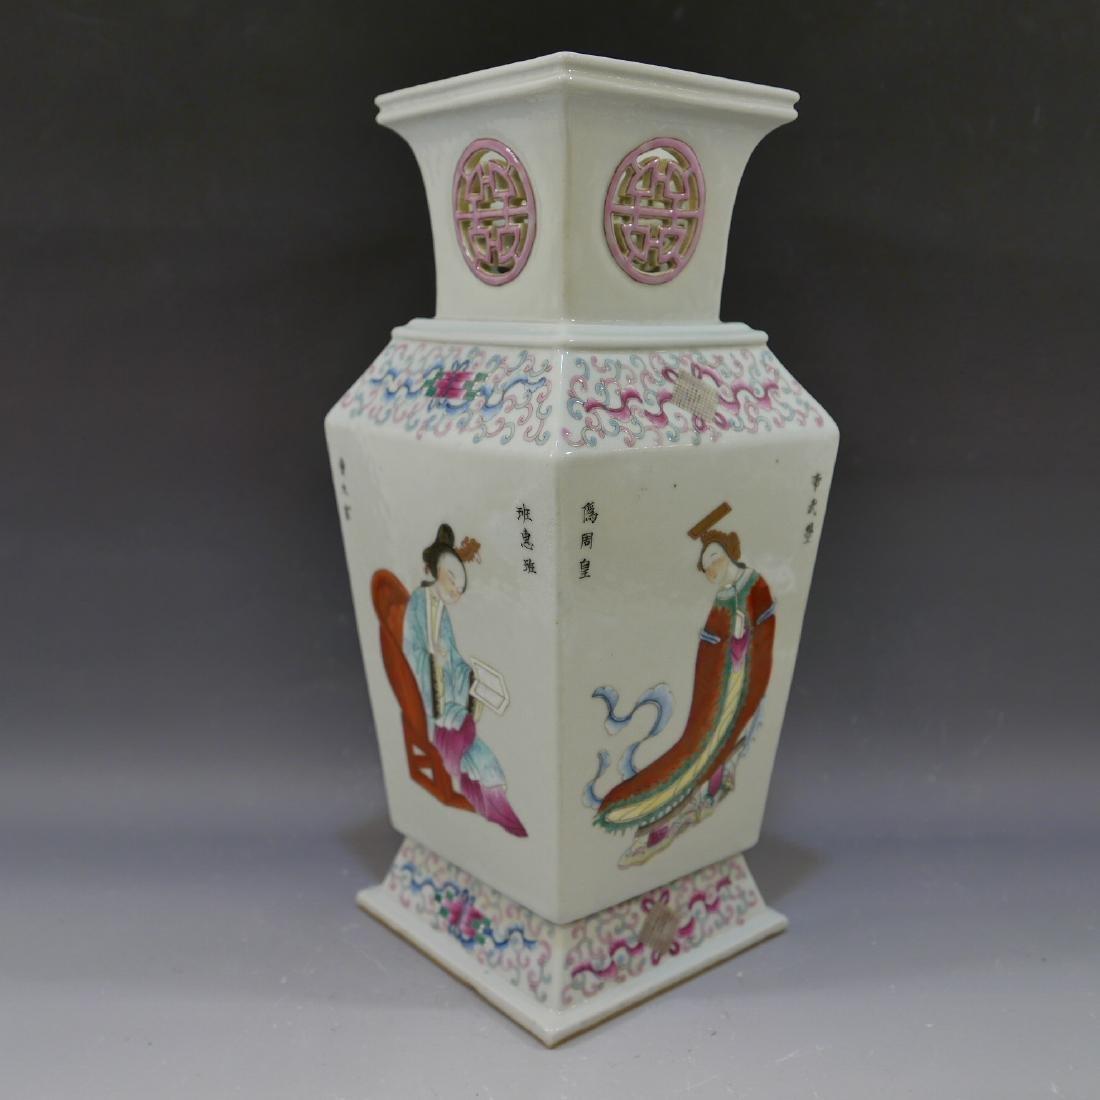 ANTIQUE CHINESE FAMILLE ROSE PORCELAIN VASE - 19TH